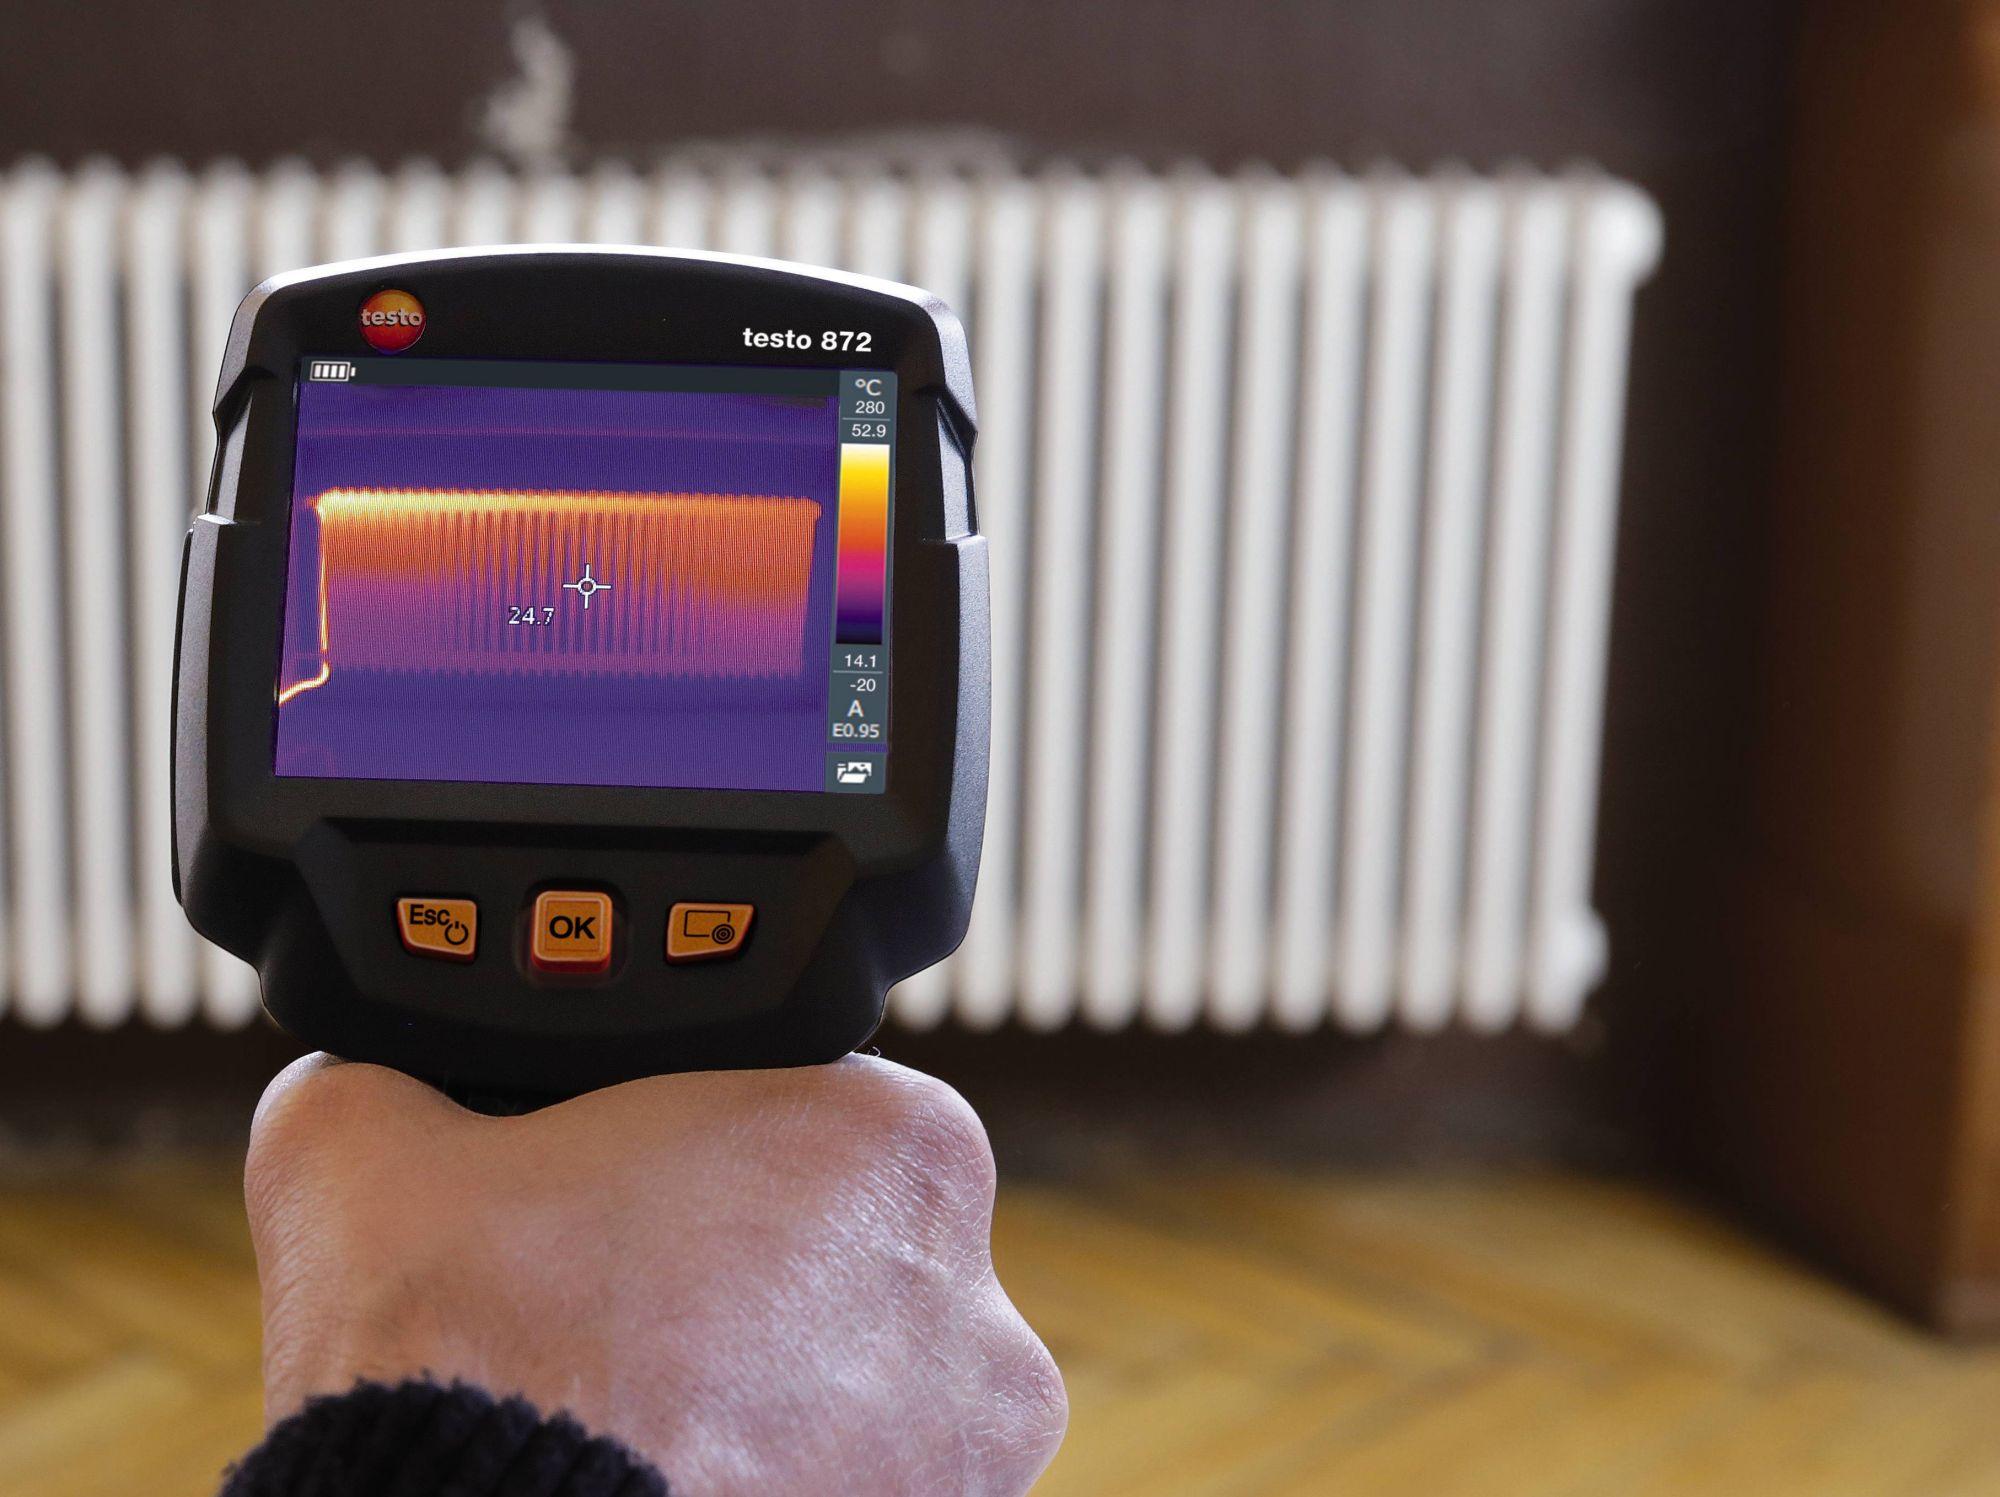 Thermografie Anwendung im SHK-Handwerk